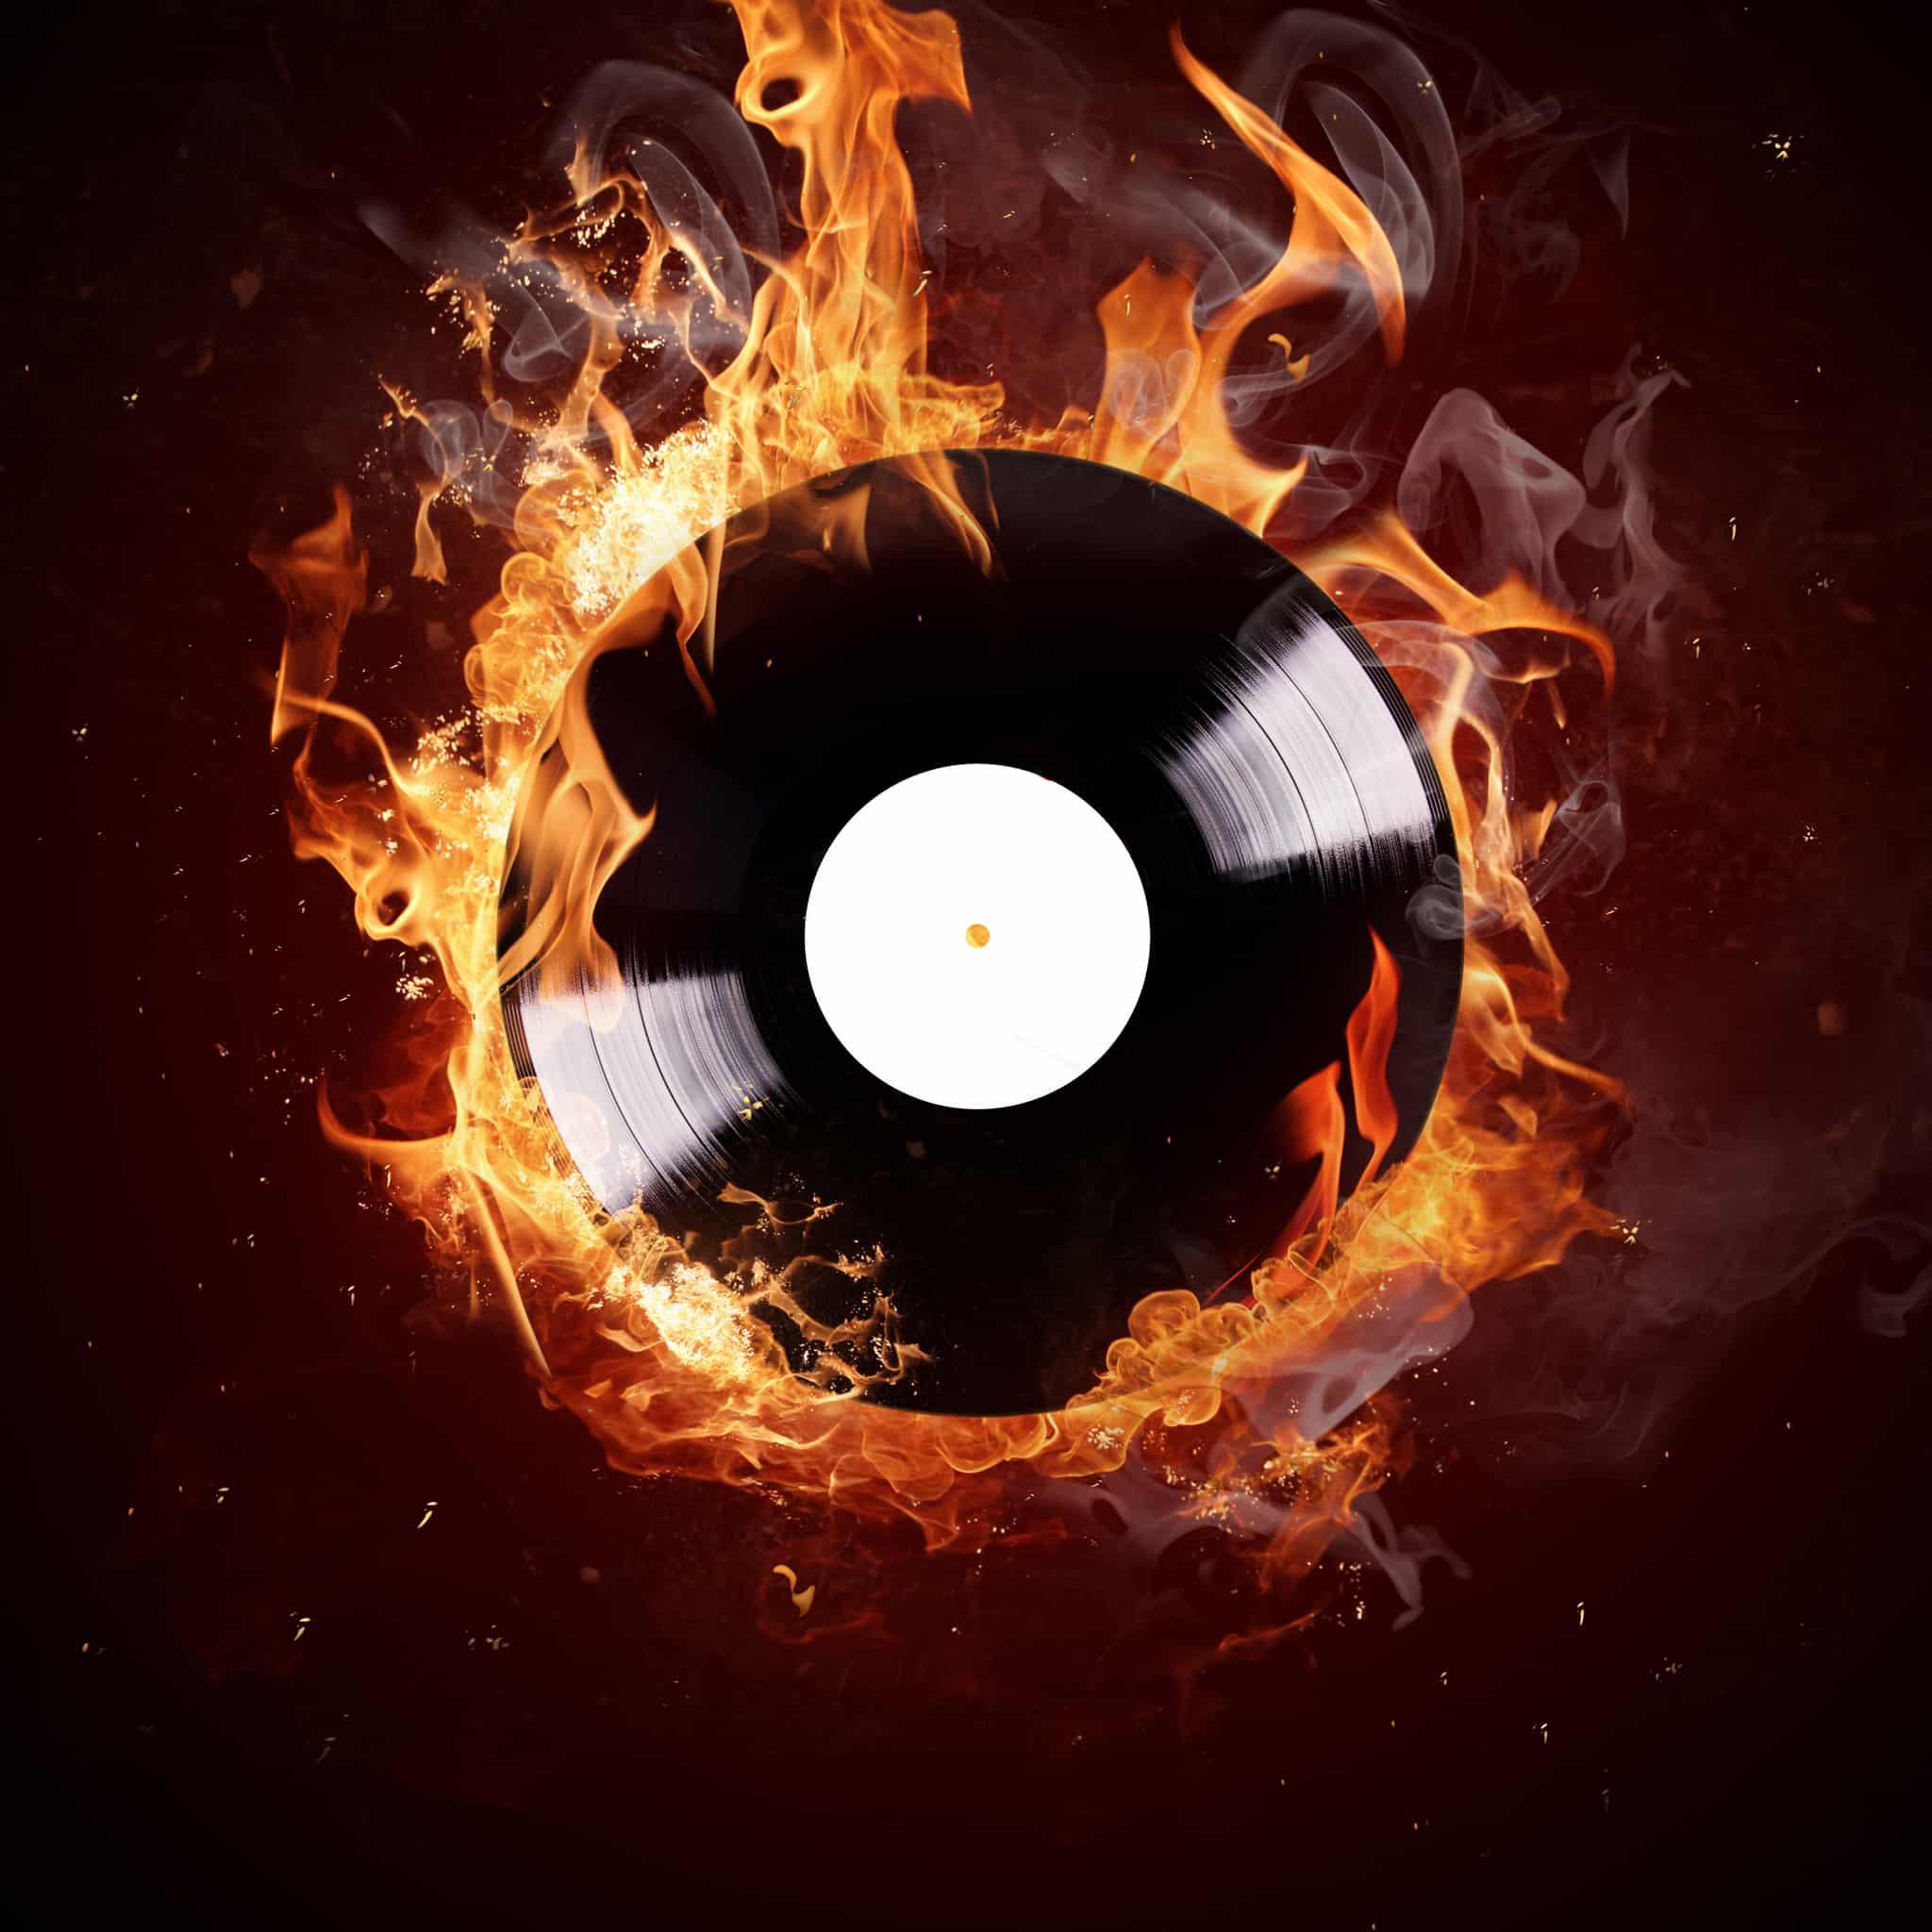 DJ Energy - Enter The Future